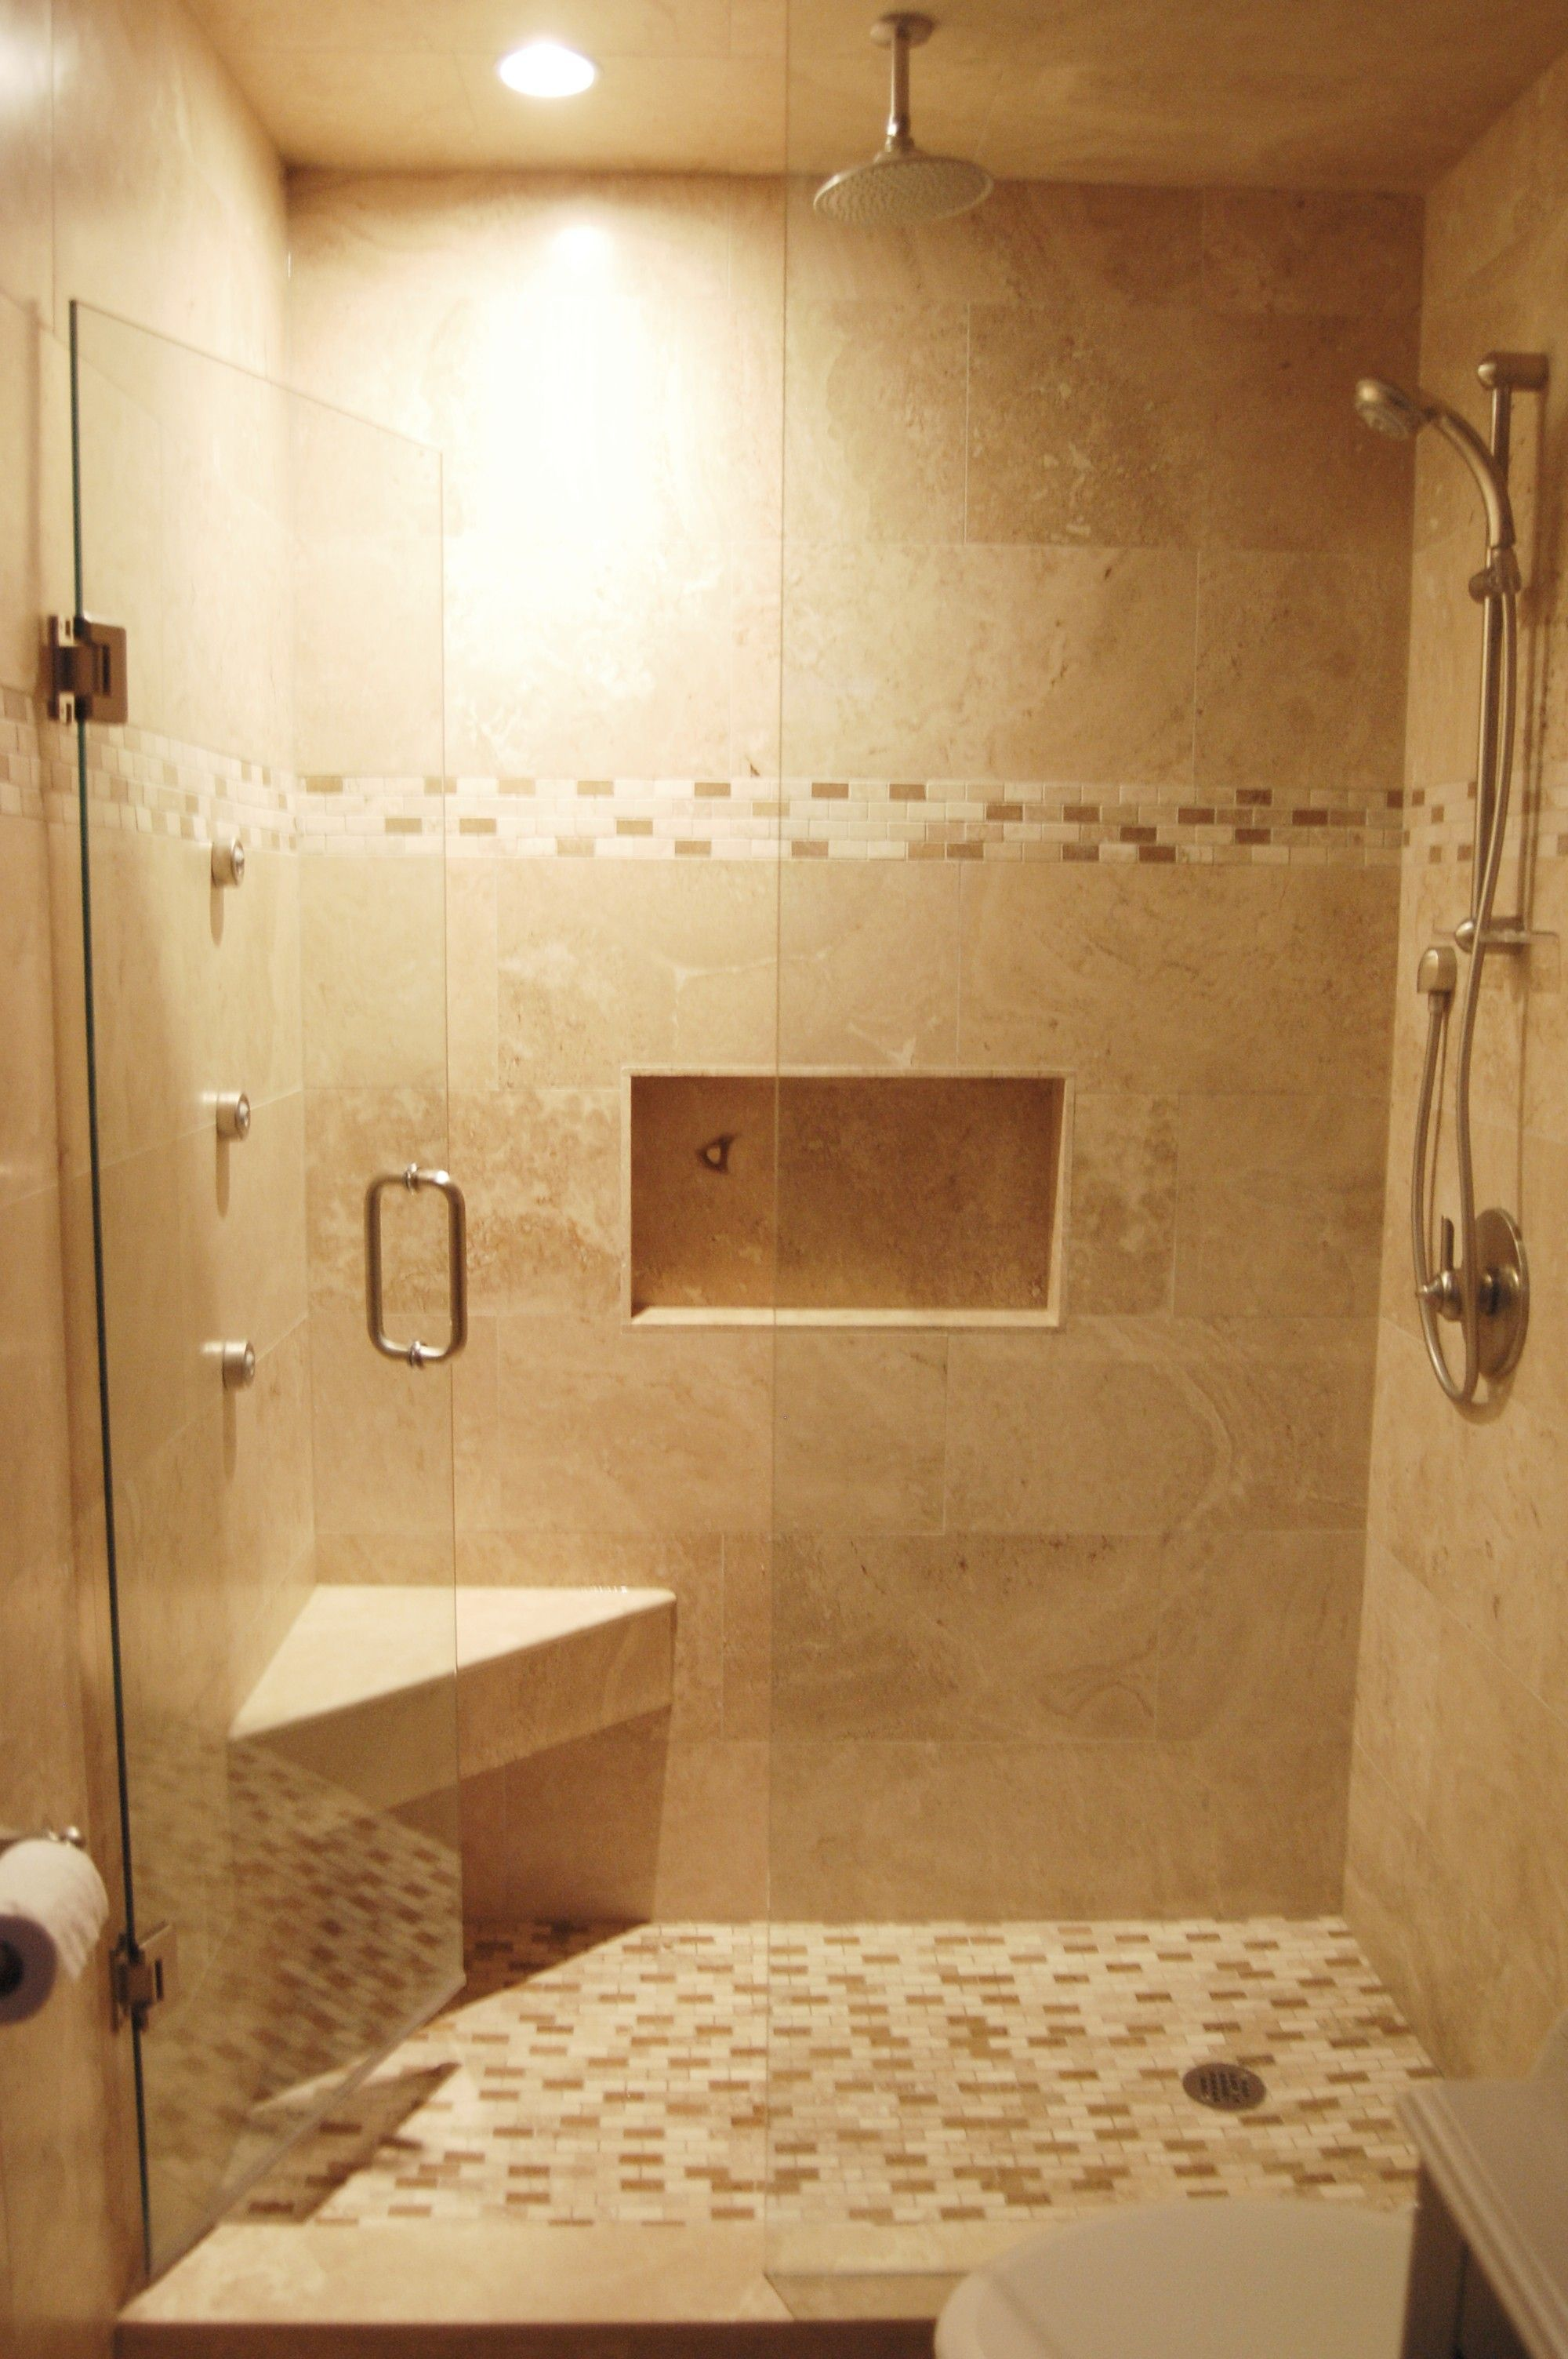 Renovate Into The Future Keep The Tub Or Convert To Shower Cuartos De Banos Pequenos Remodelacion Del Bano Cabinas De Ducha